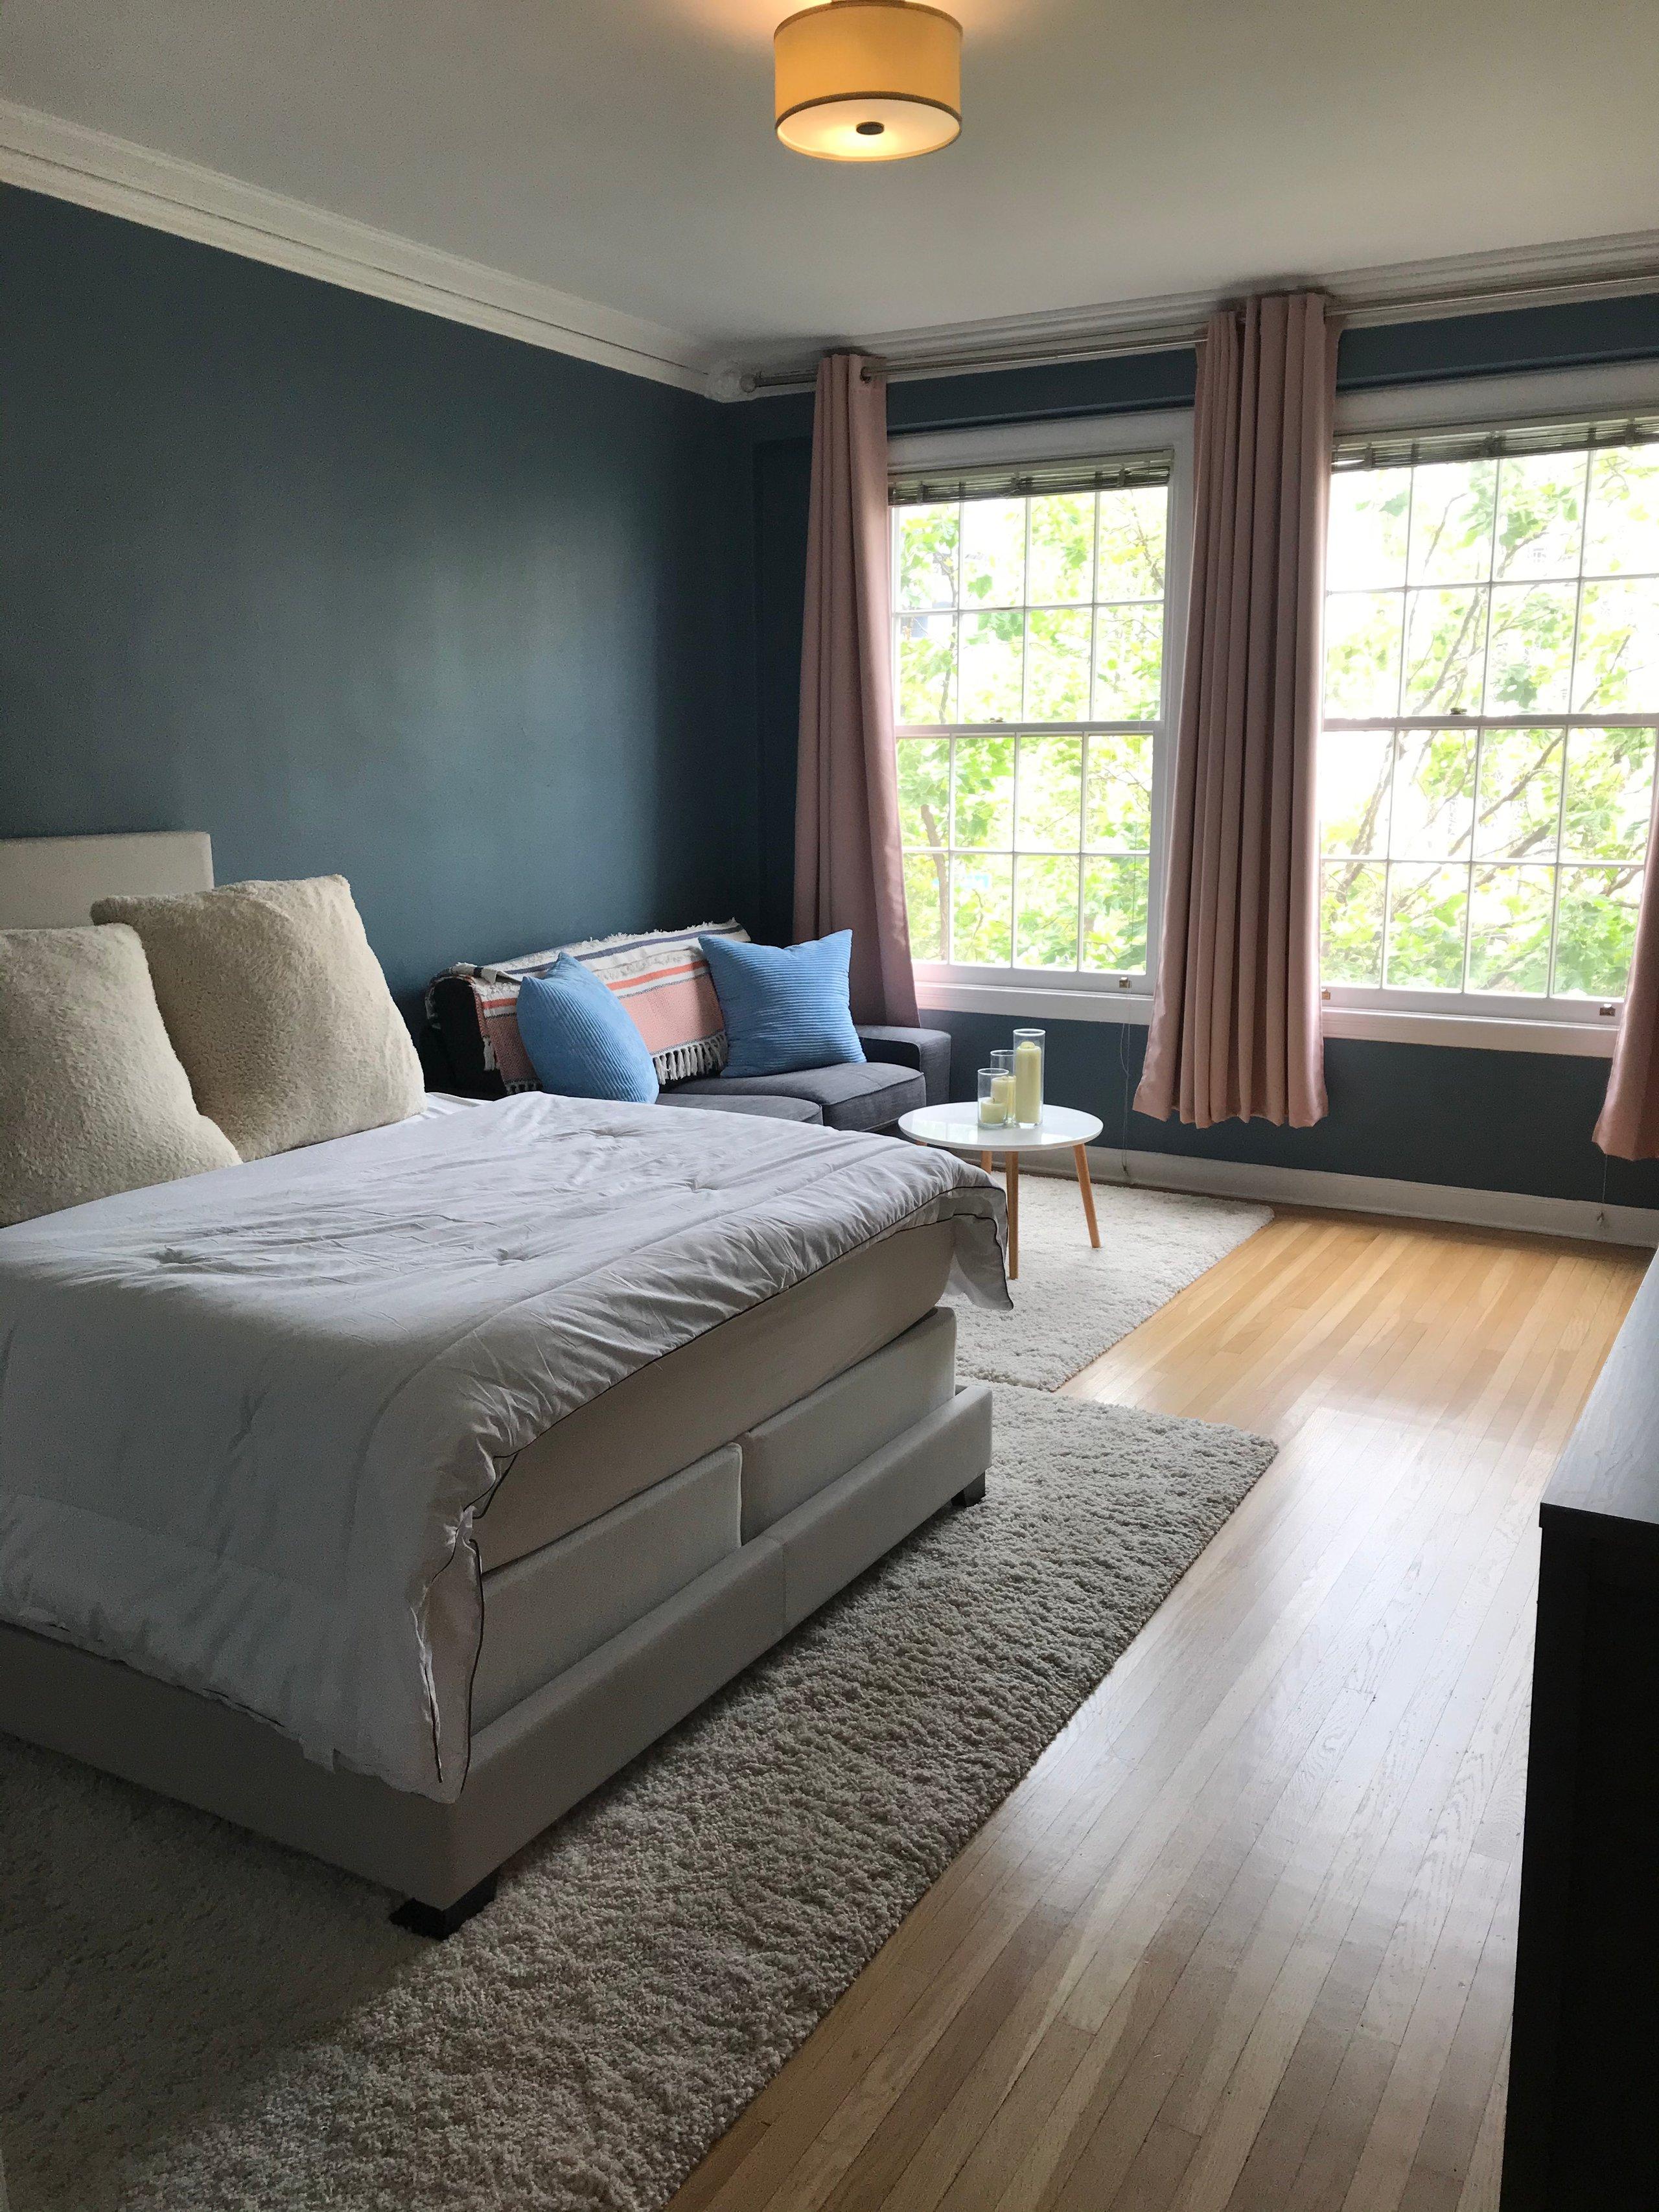 16x12 Bedroom self storage unit